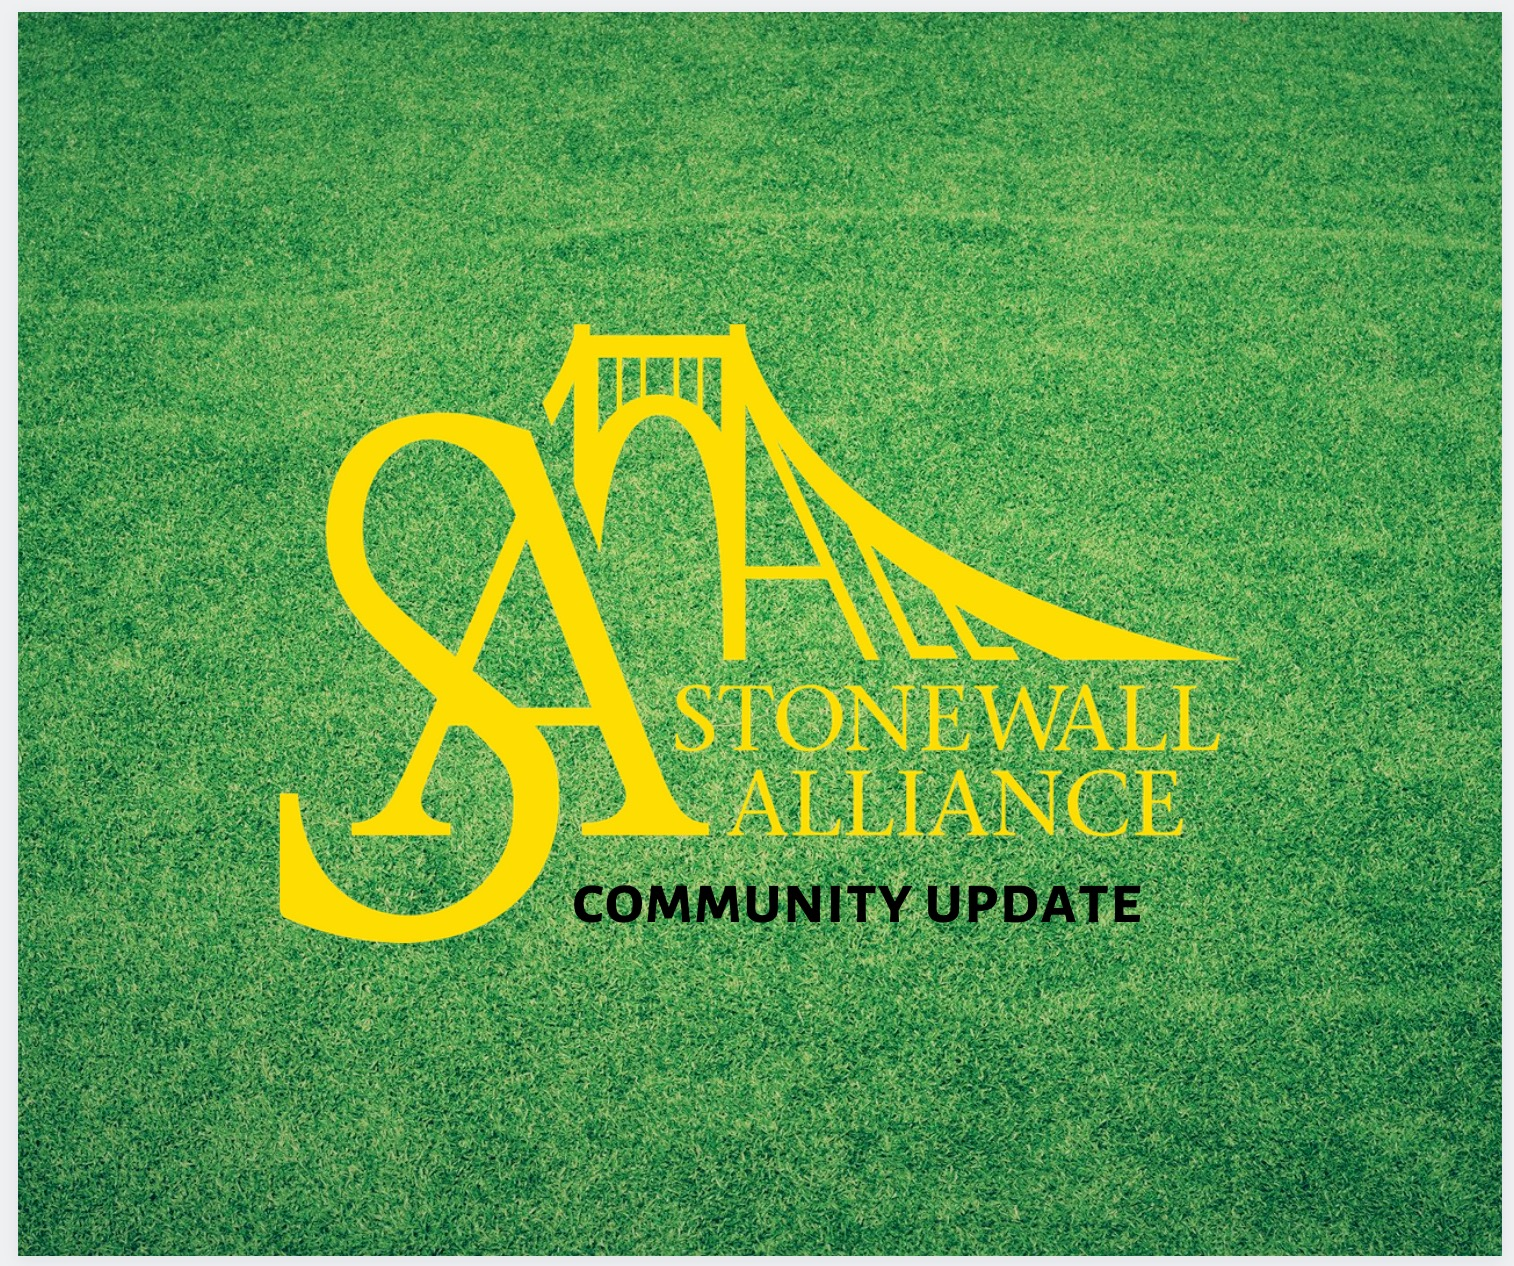 Stonewall Alliance Community Update